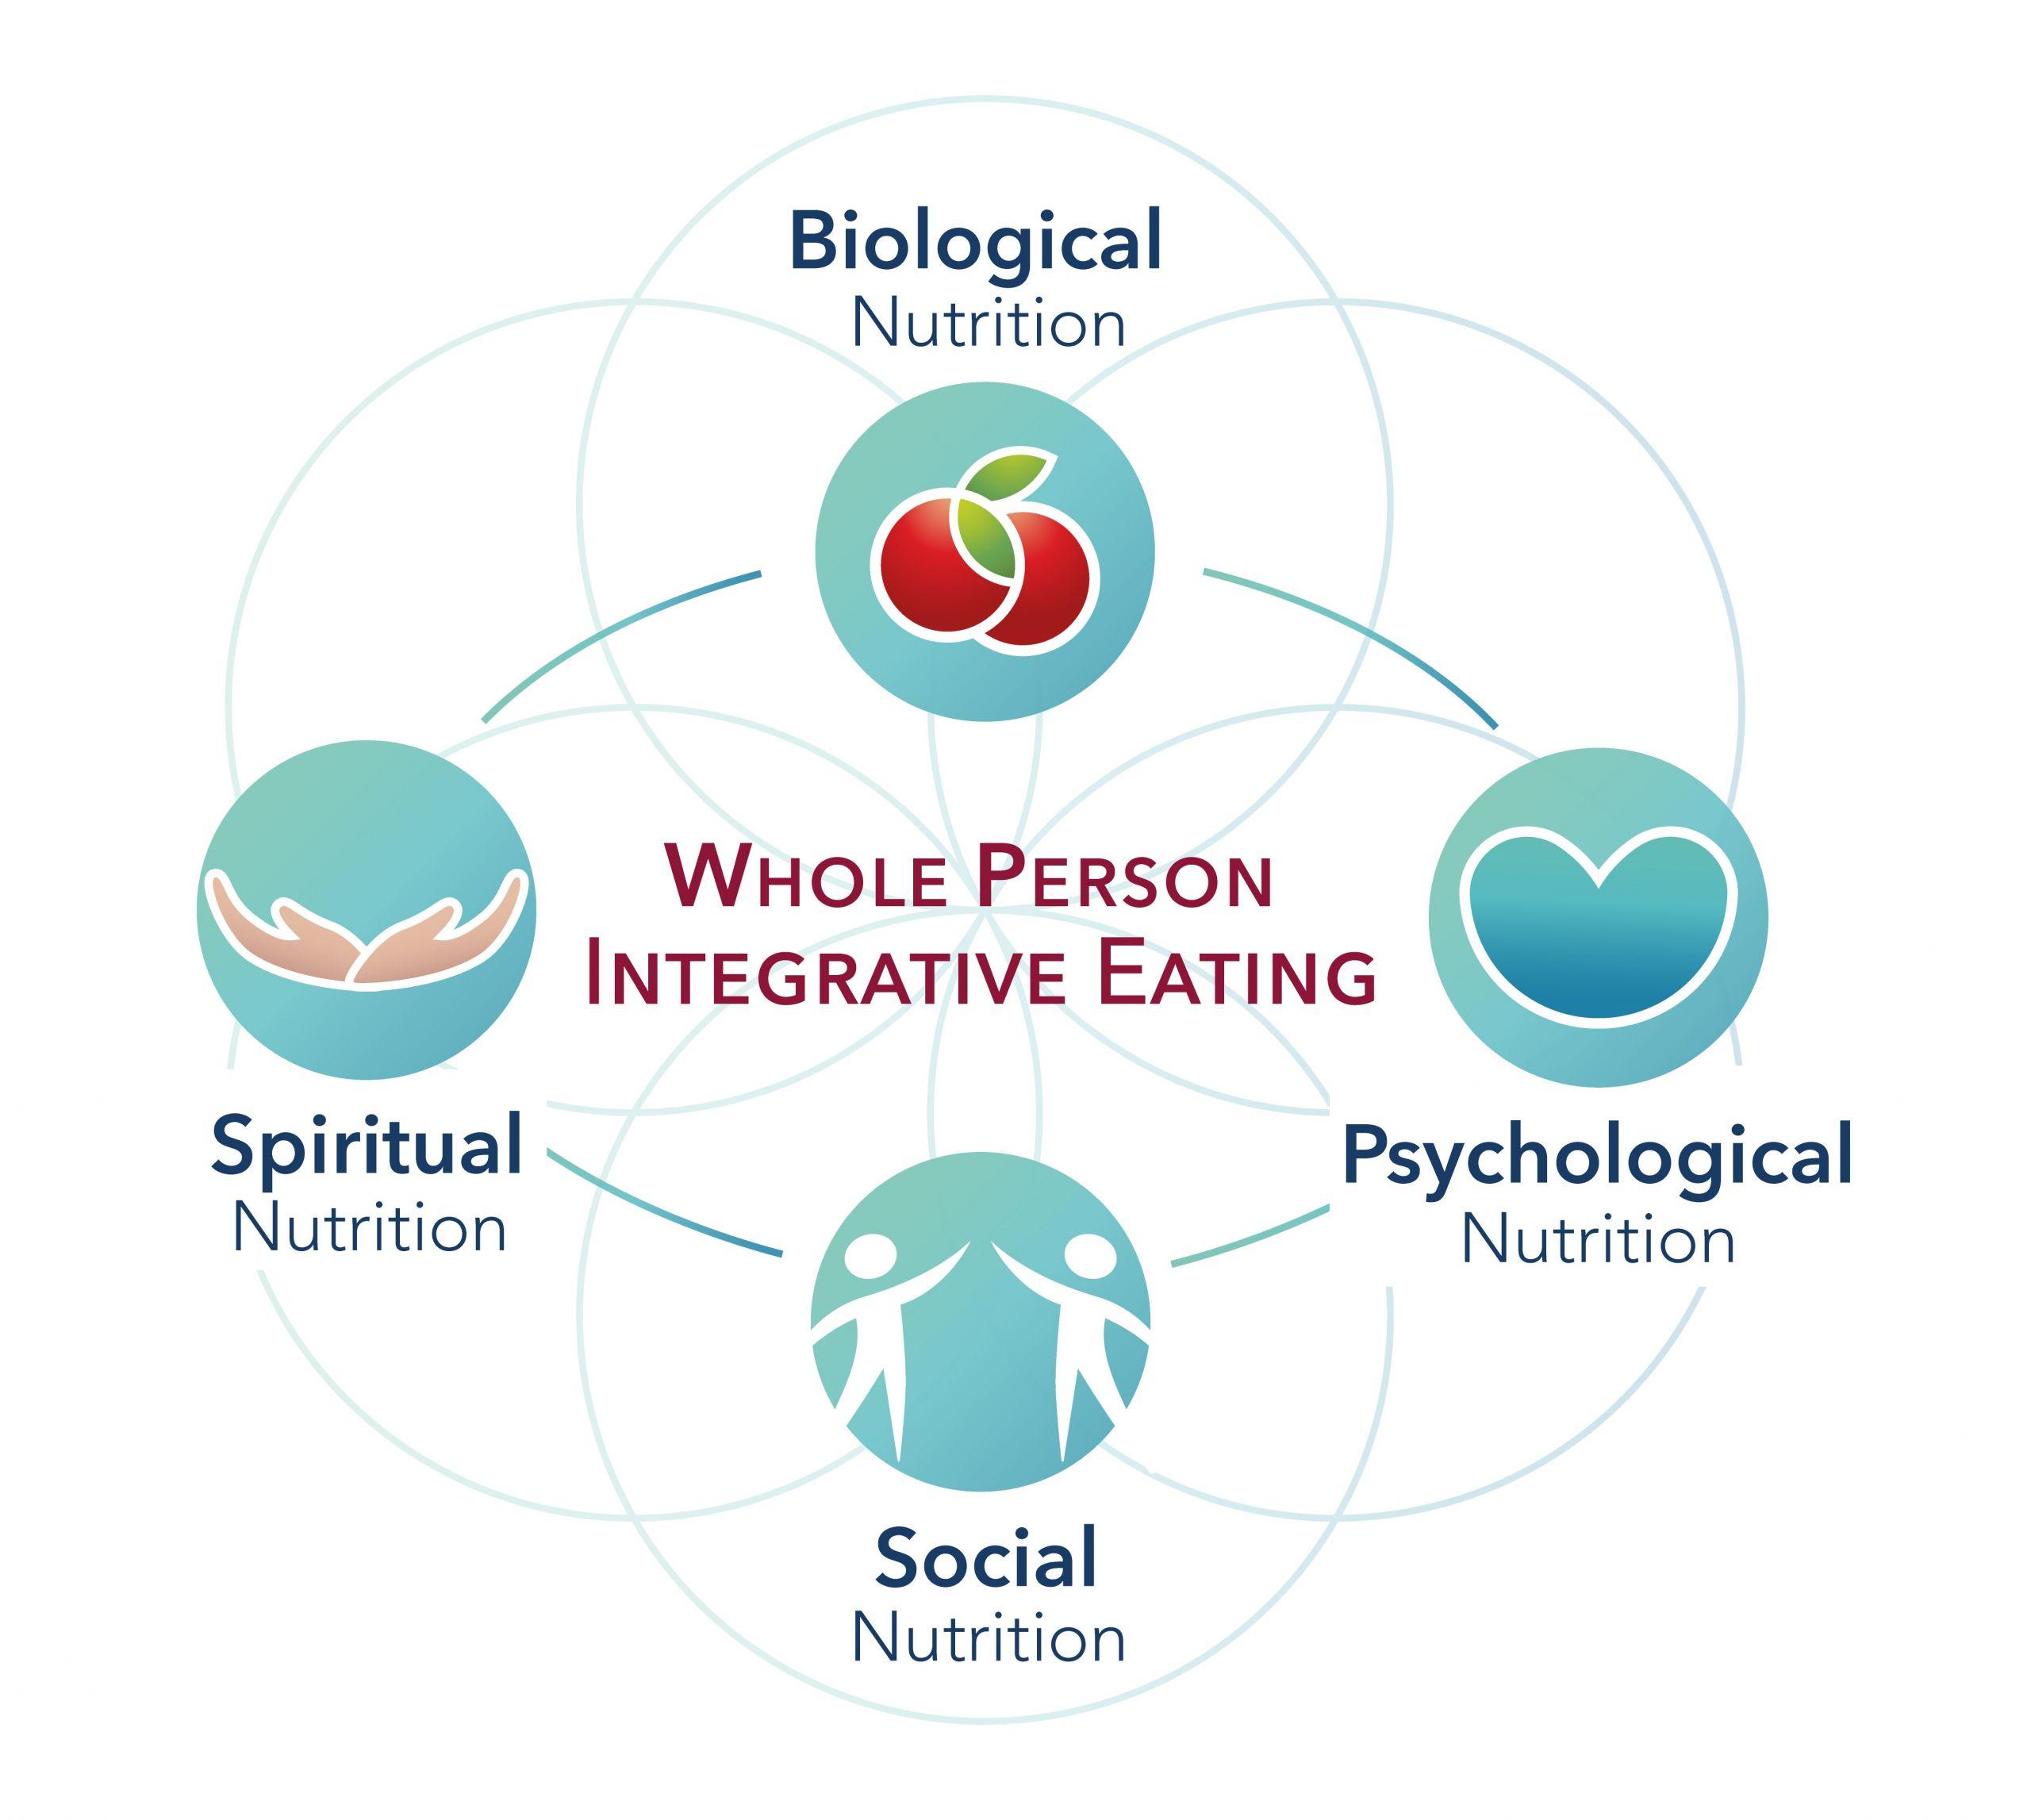 livre Whole Person Integrative Eating Kesten